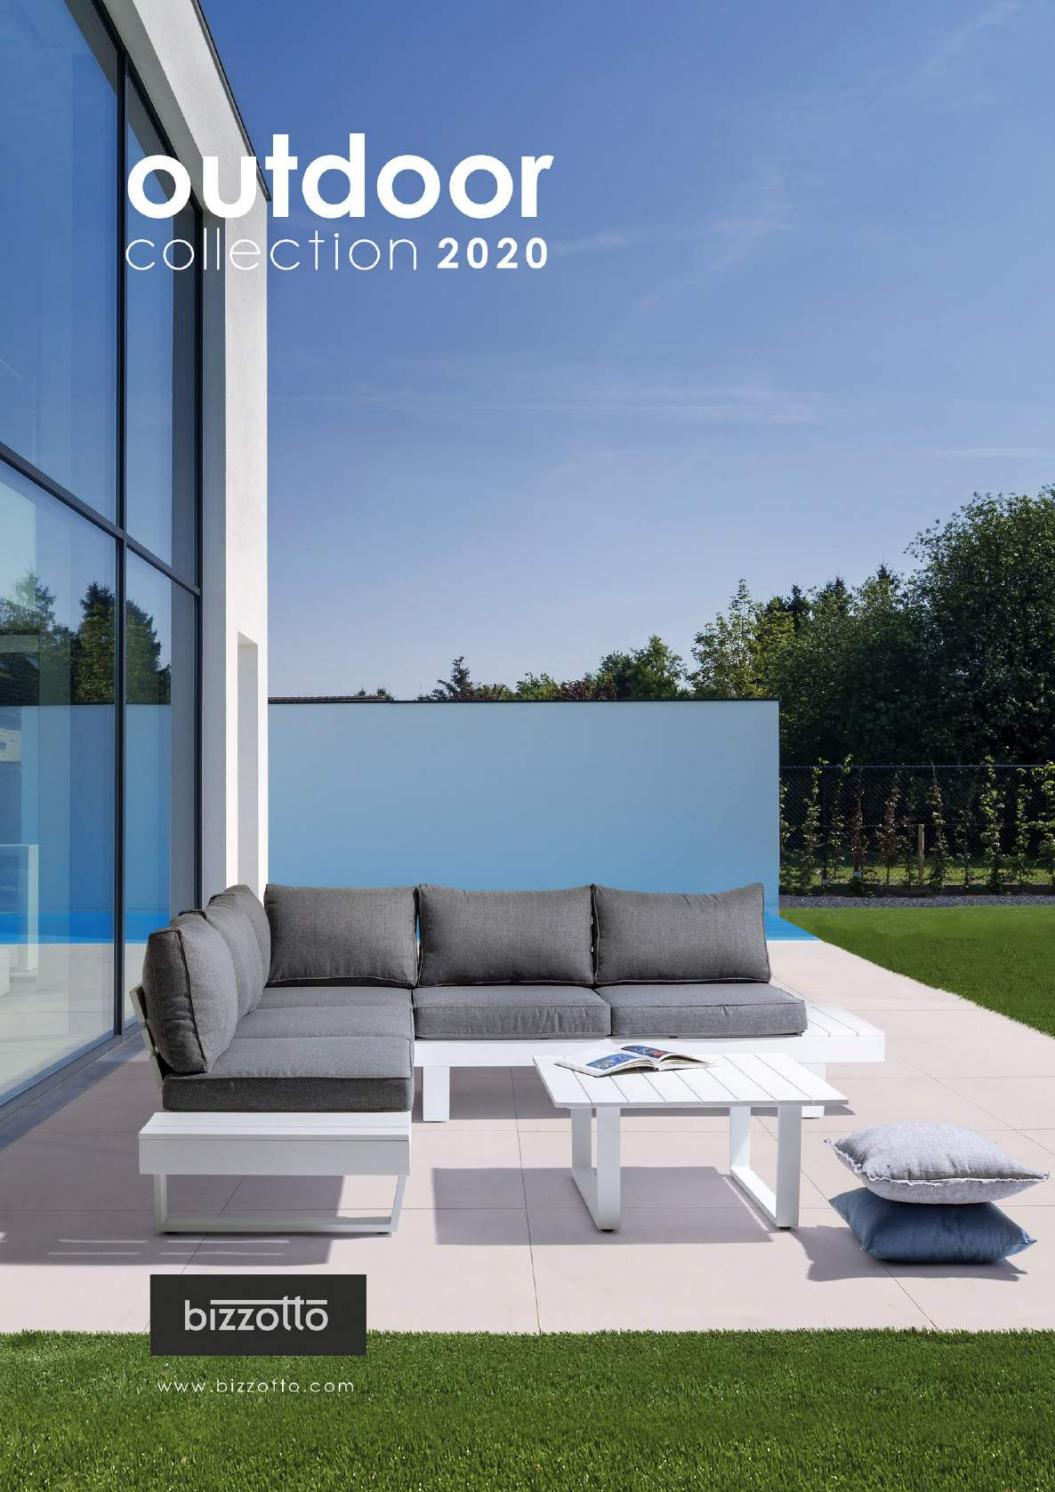 Catalogo Outdoor Collection Bizzotto 2020 By Andrea Bizzotto